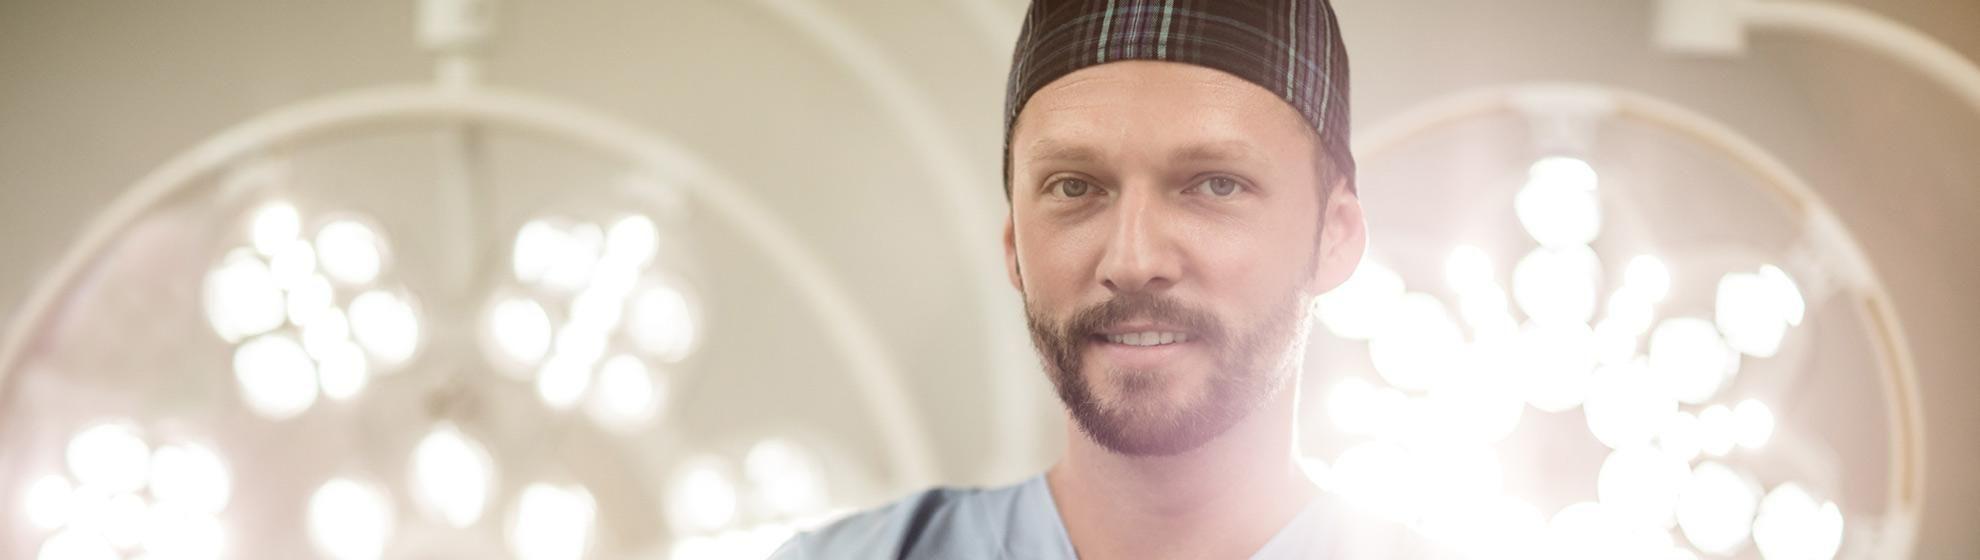 MUDr. Juraj Payer Ph.D., FEBOPRAS